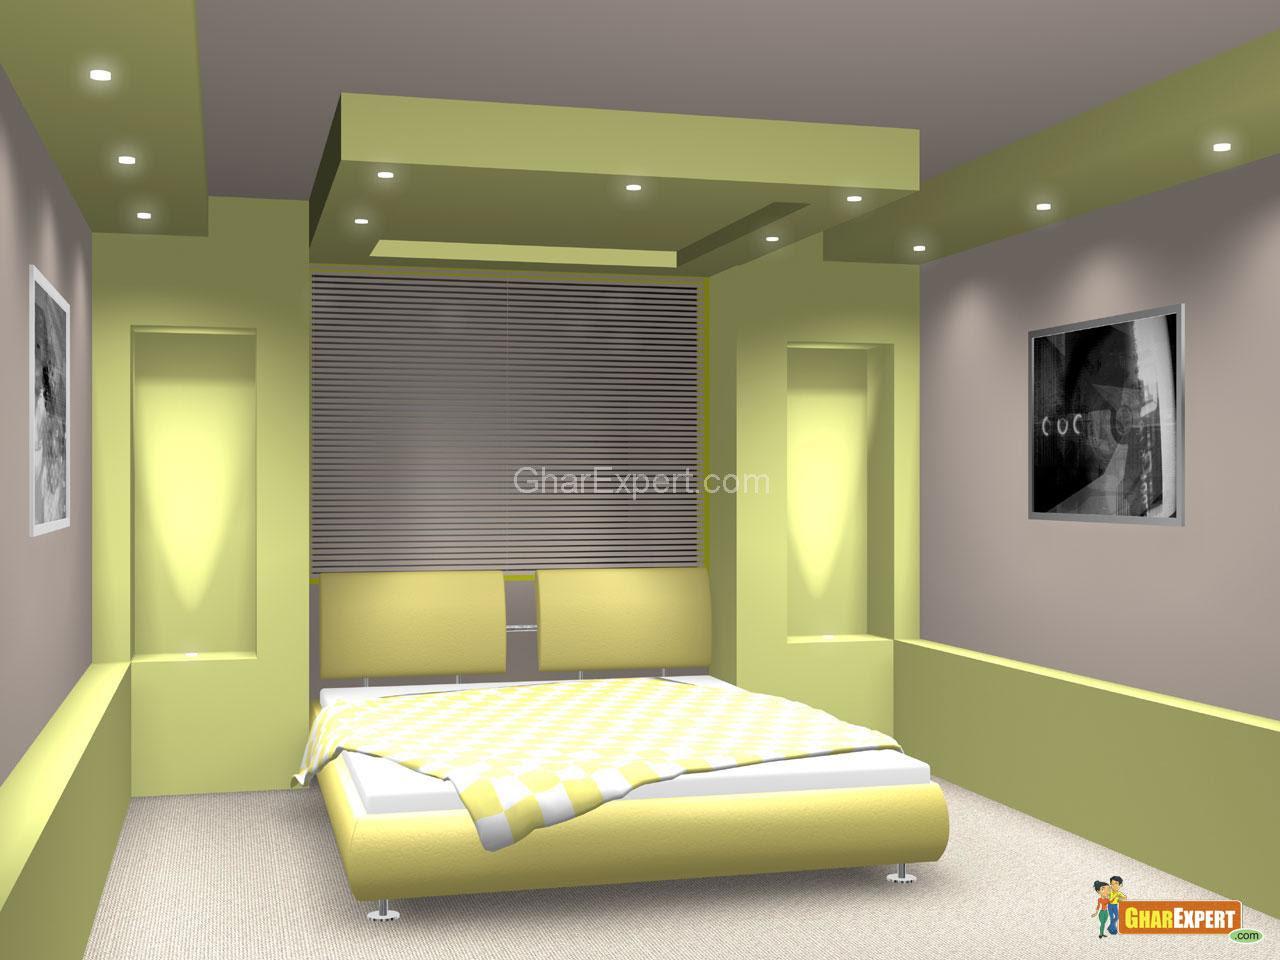 Bedroom Ceiling Lighting | Decorative Ceiling Lighting for Bedroom ...